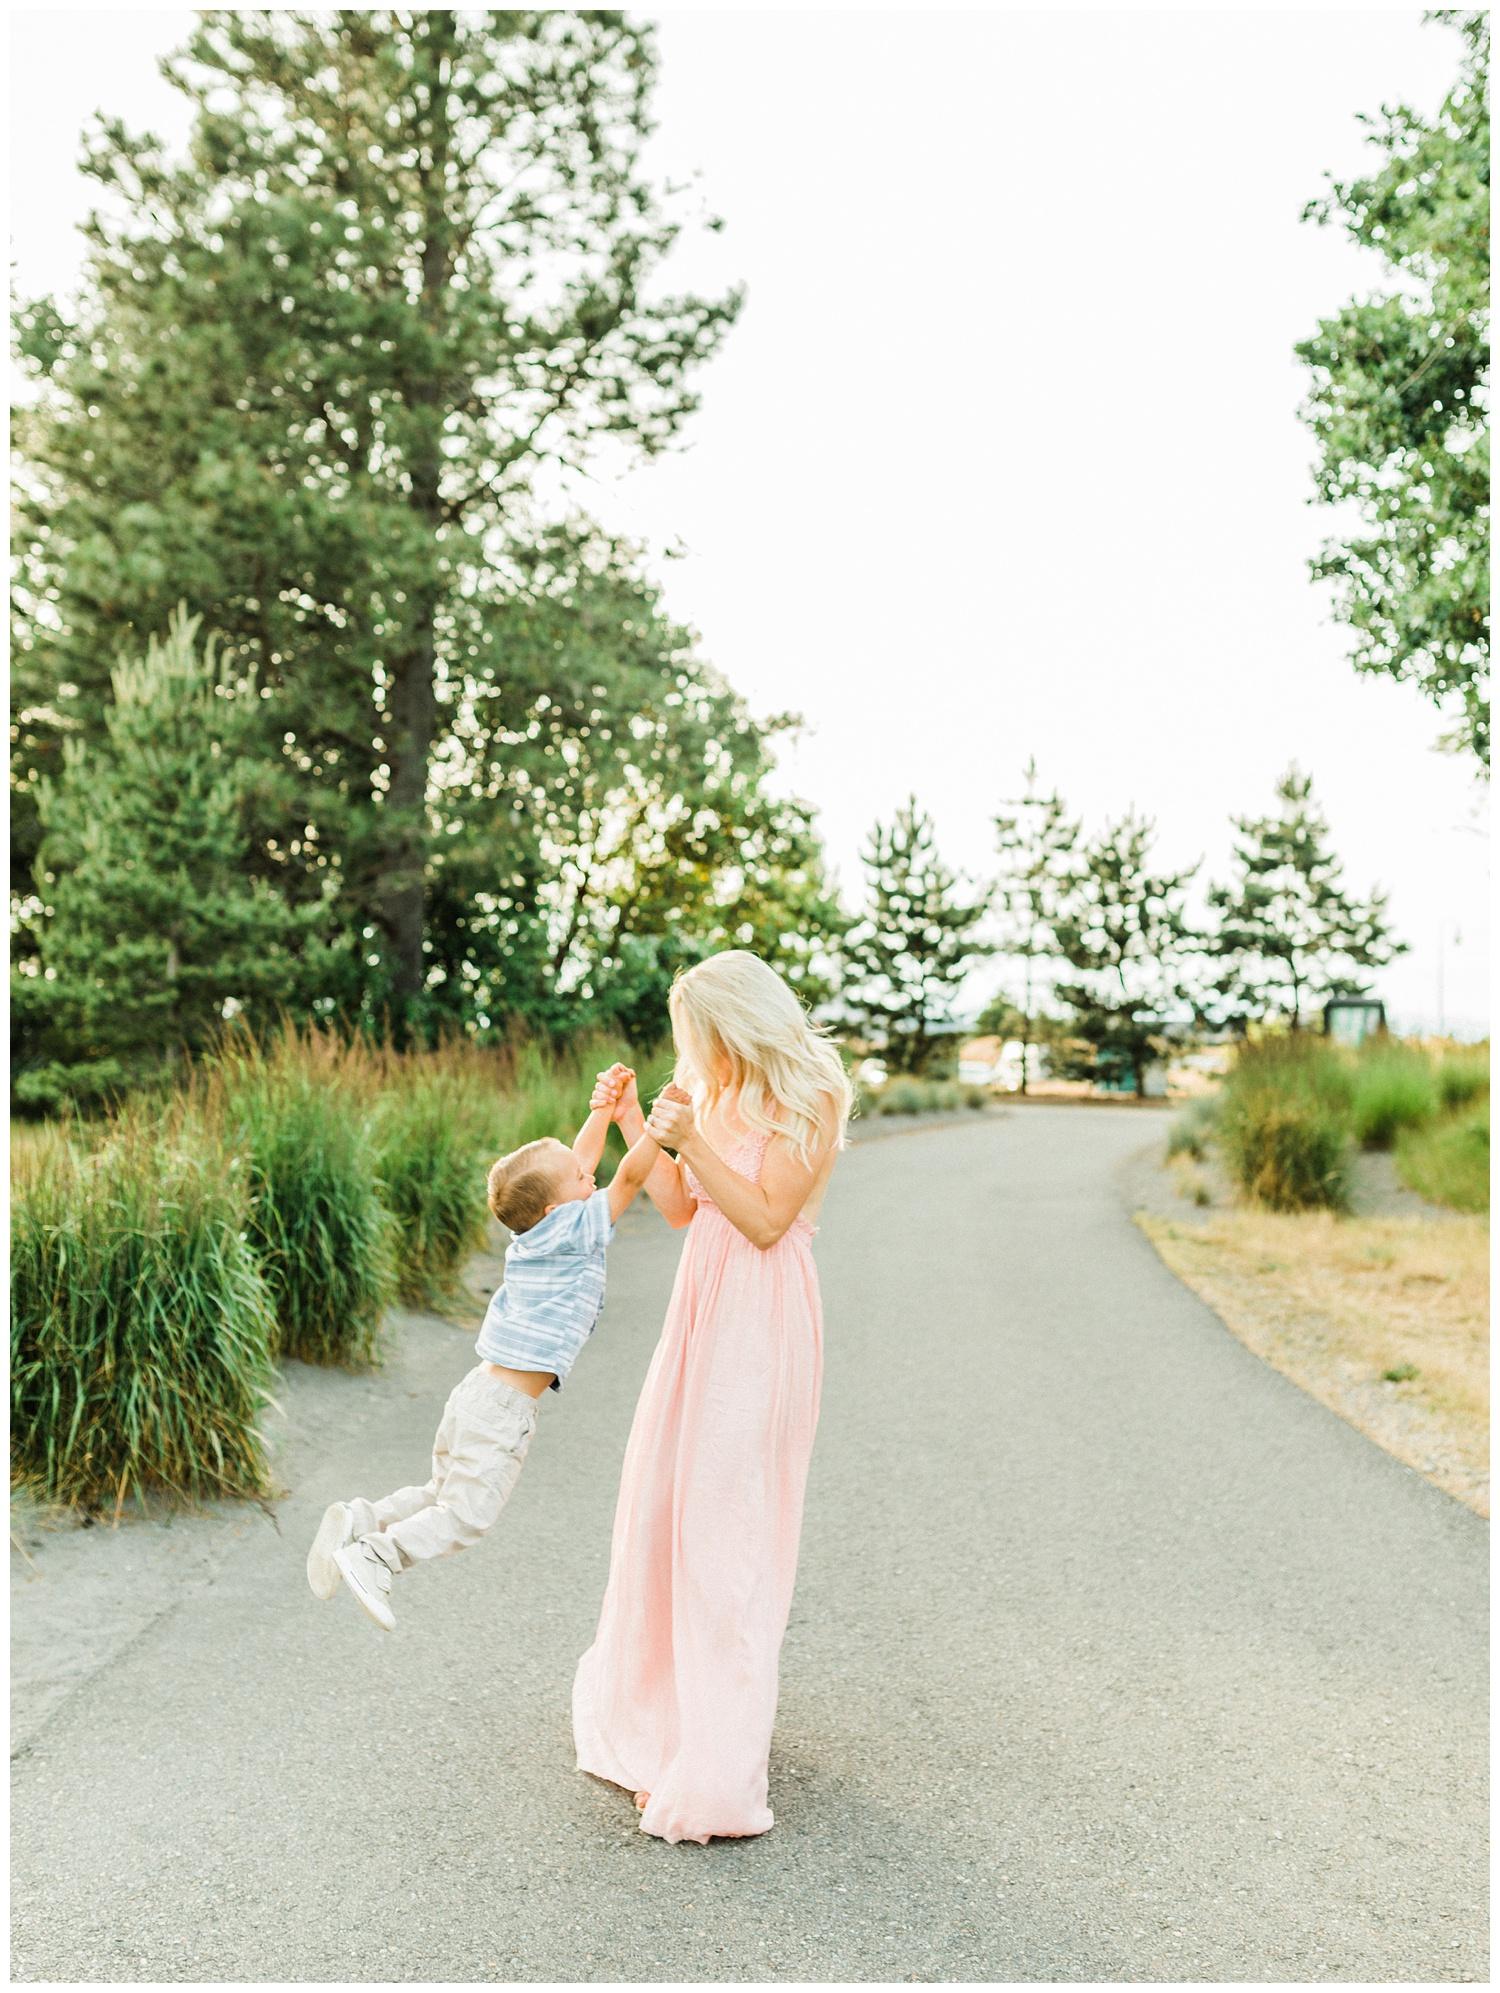 washginton-family-photographer_030.jpg